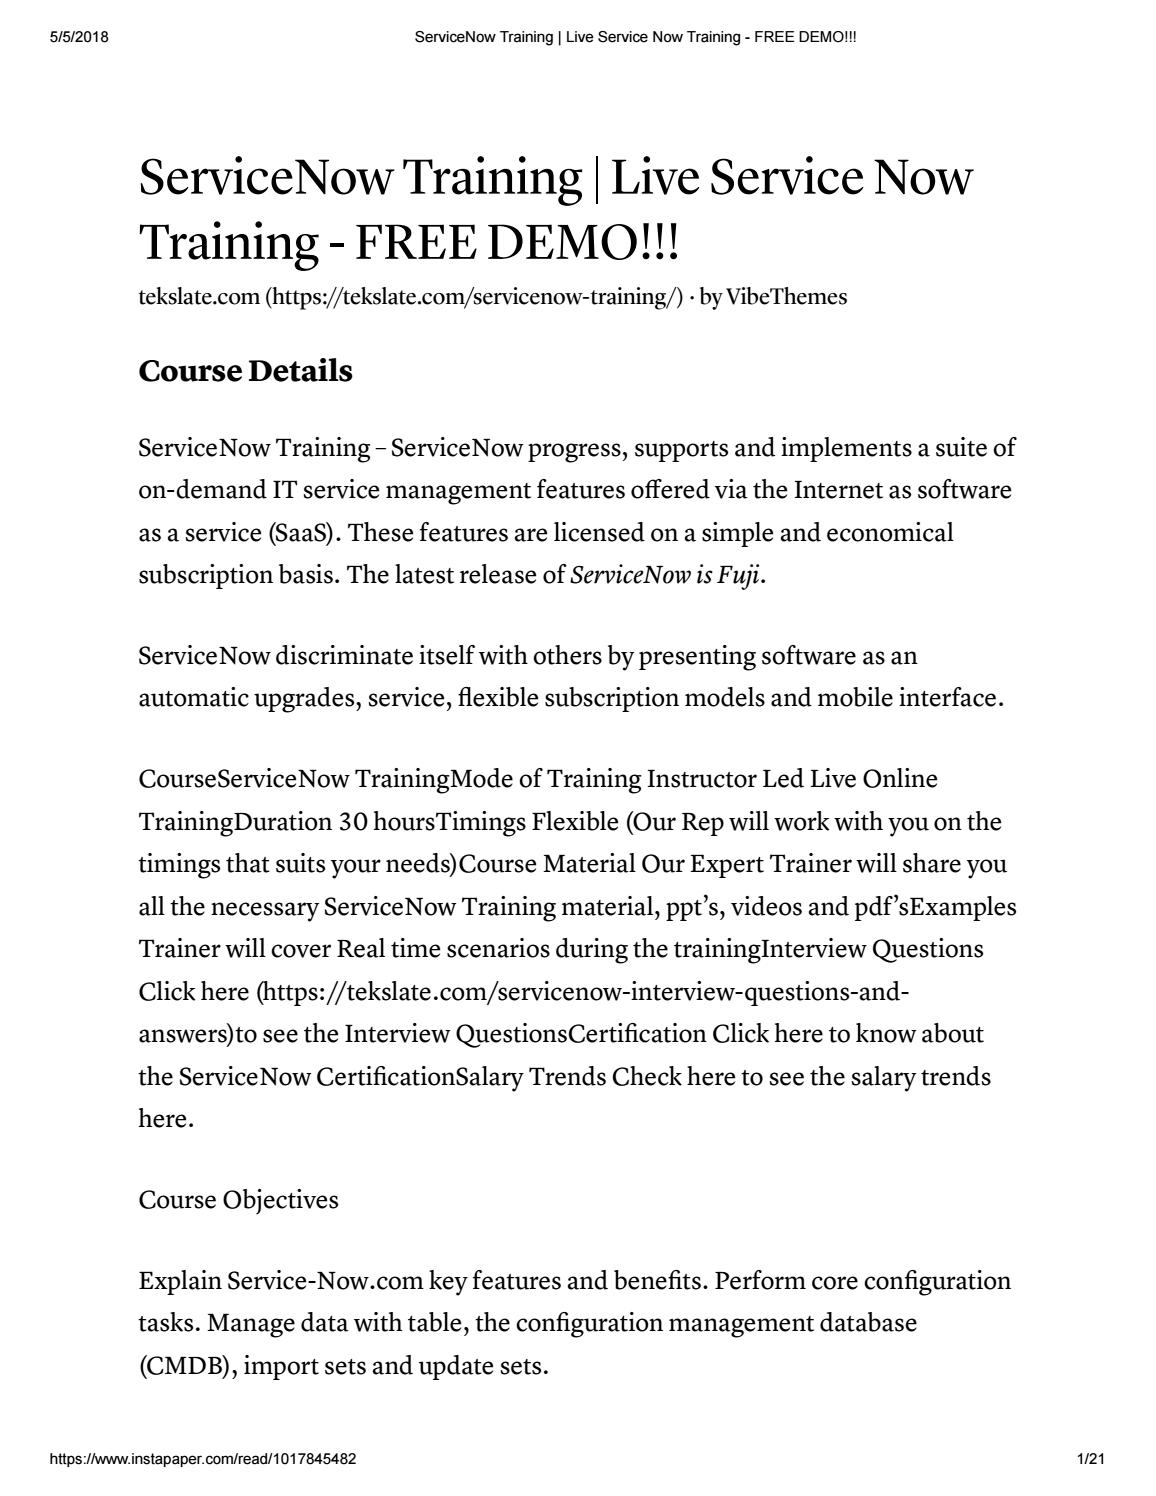 Servicenow training live service now training free demo